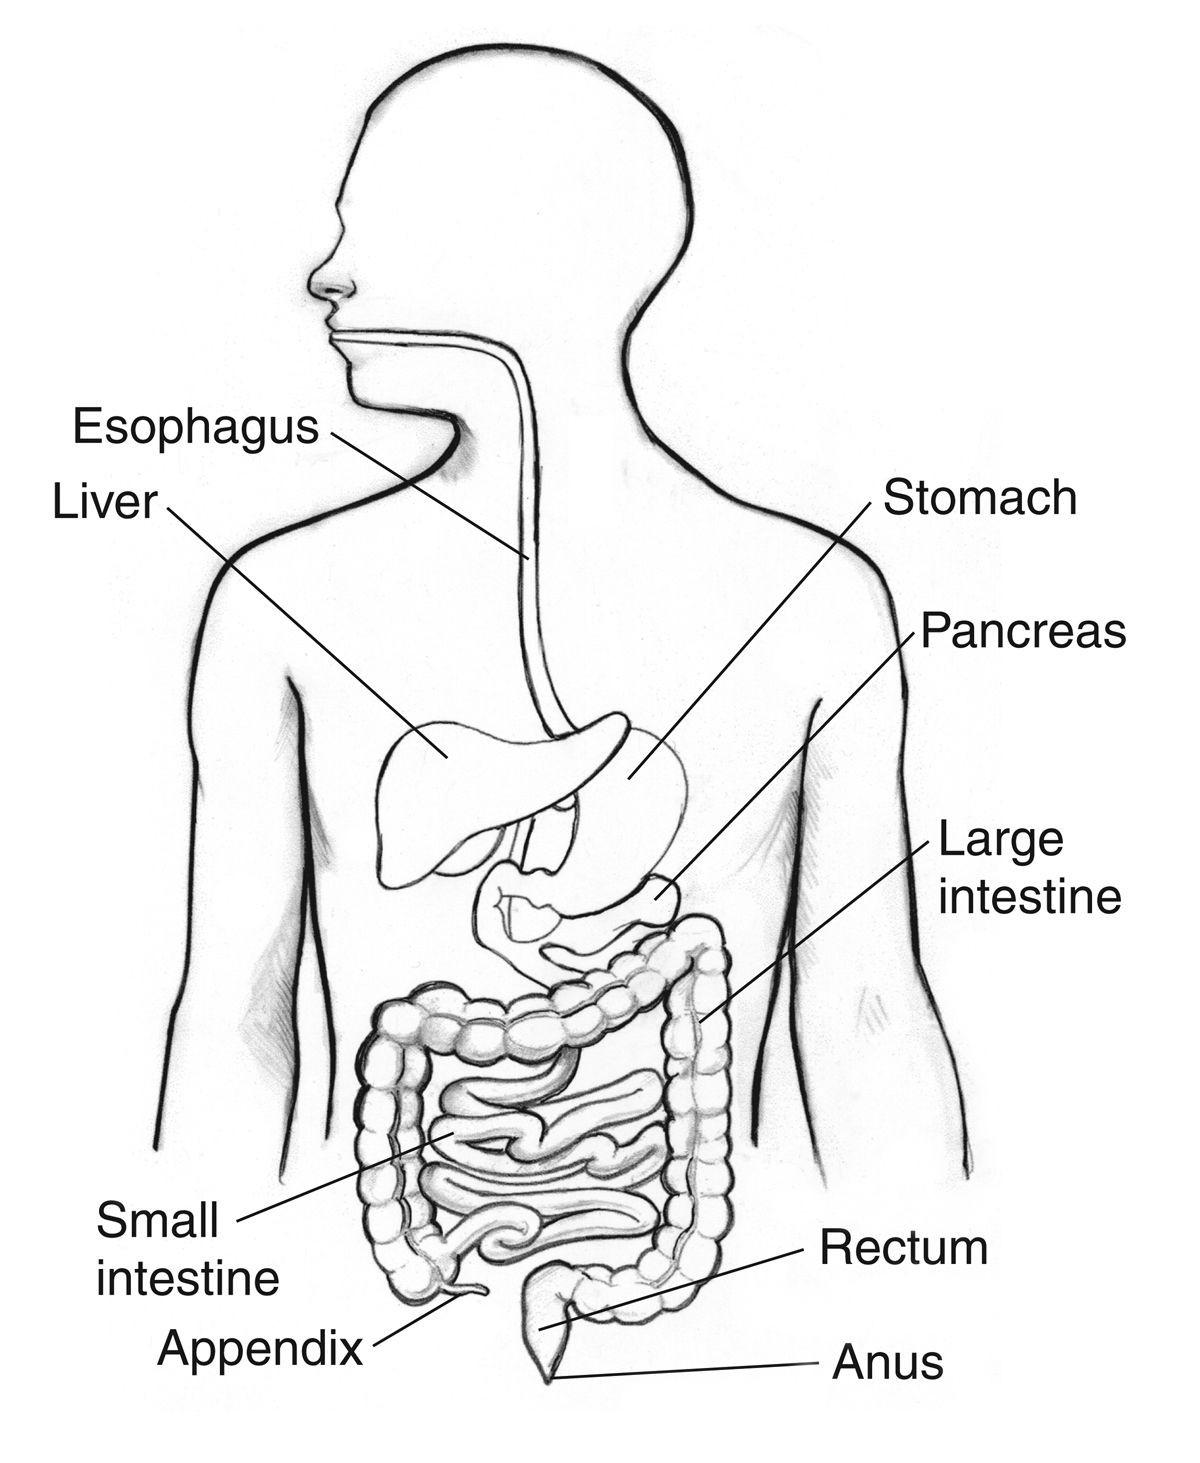 Digestive System Diagram Worksheet Human Body Systems Coloring S Lovely Digestive System Sheet Diagram